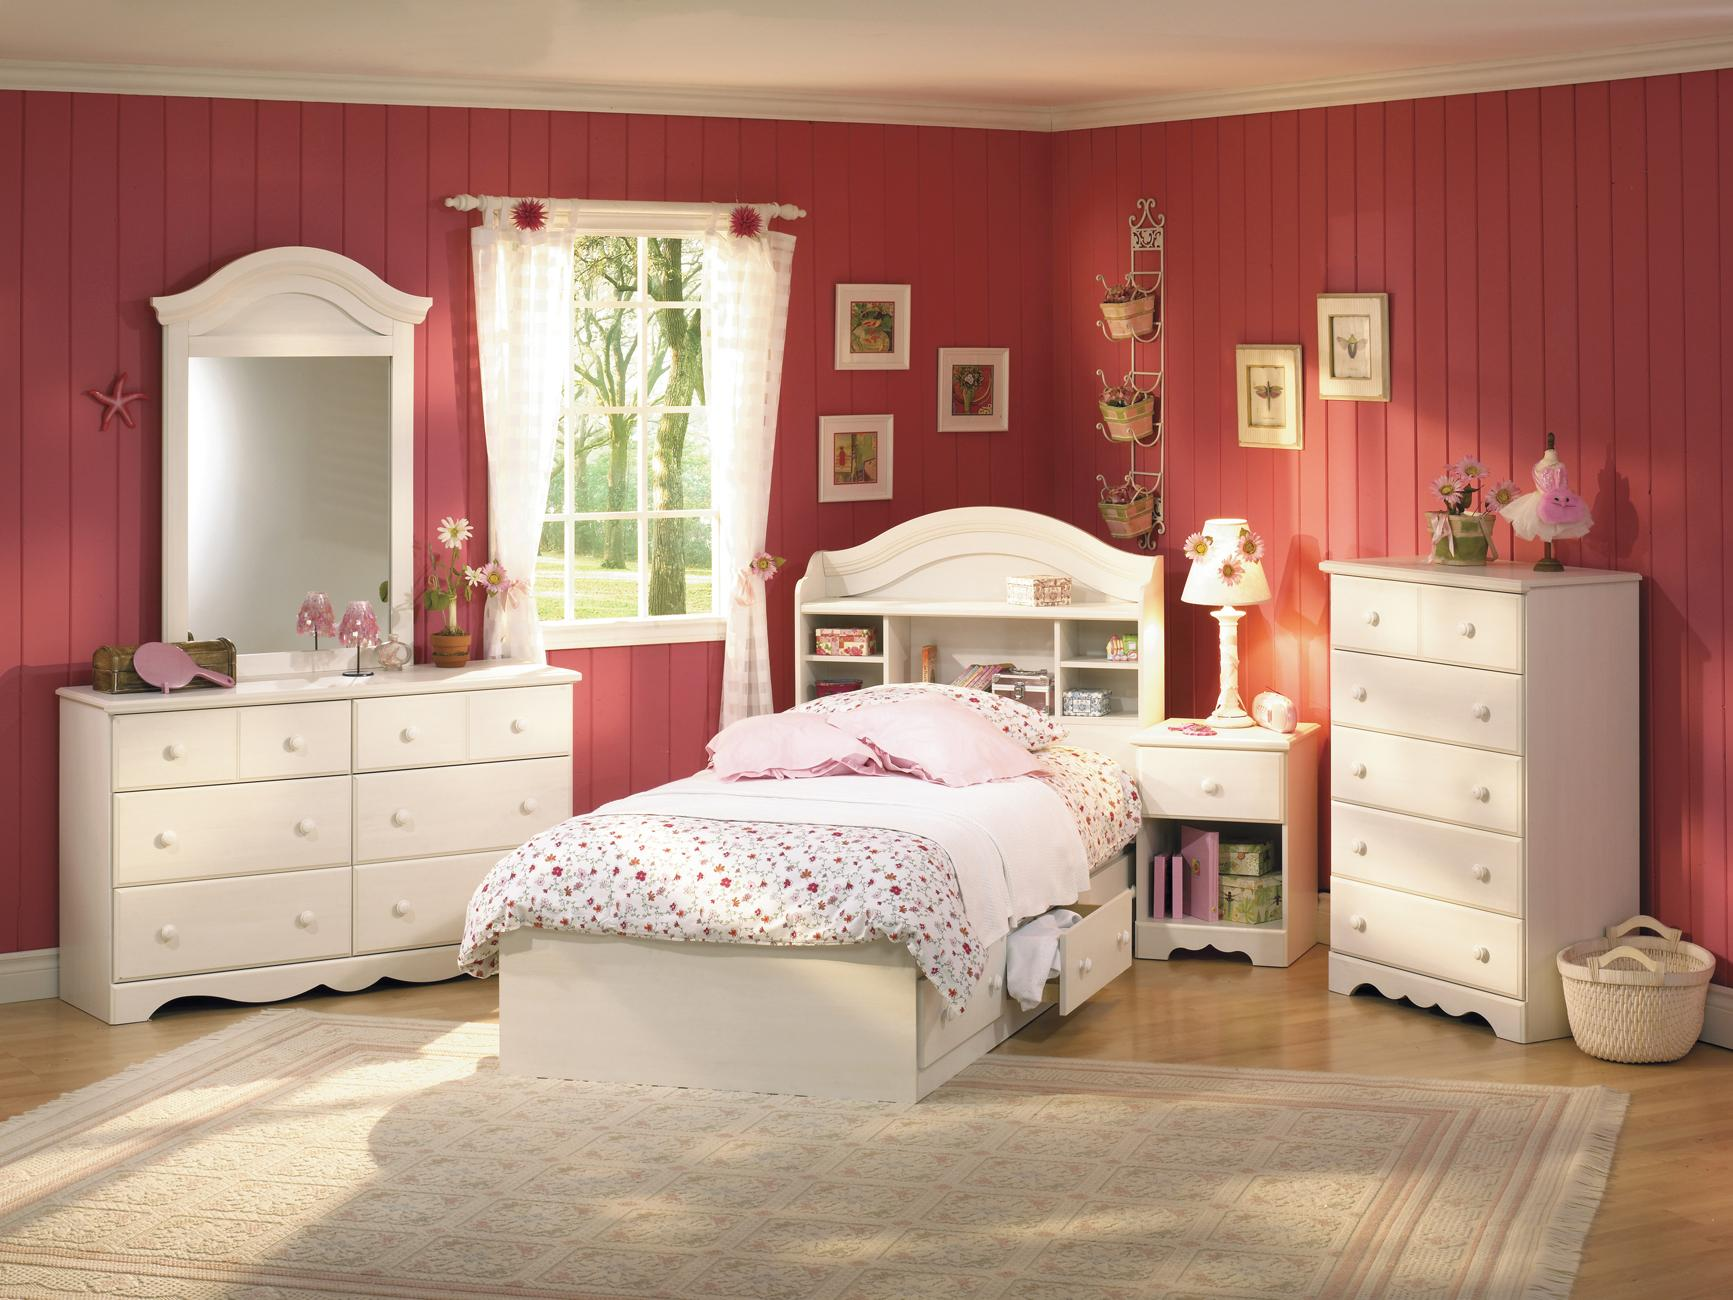 South shore furniture summer breeze - South shore furniture bedroom sets ...